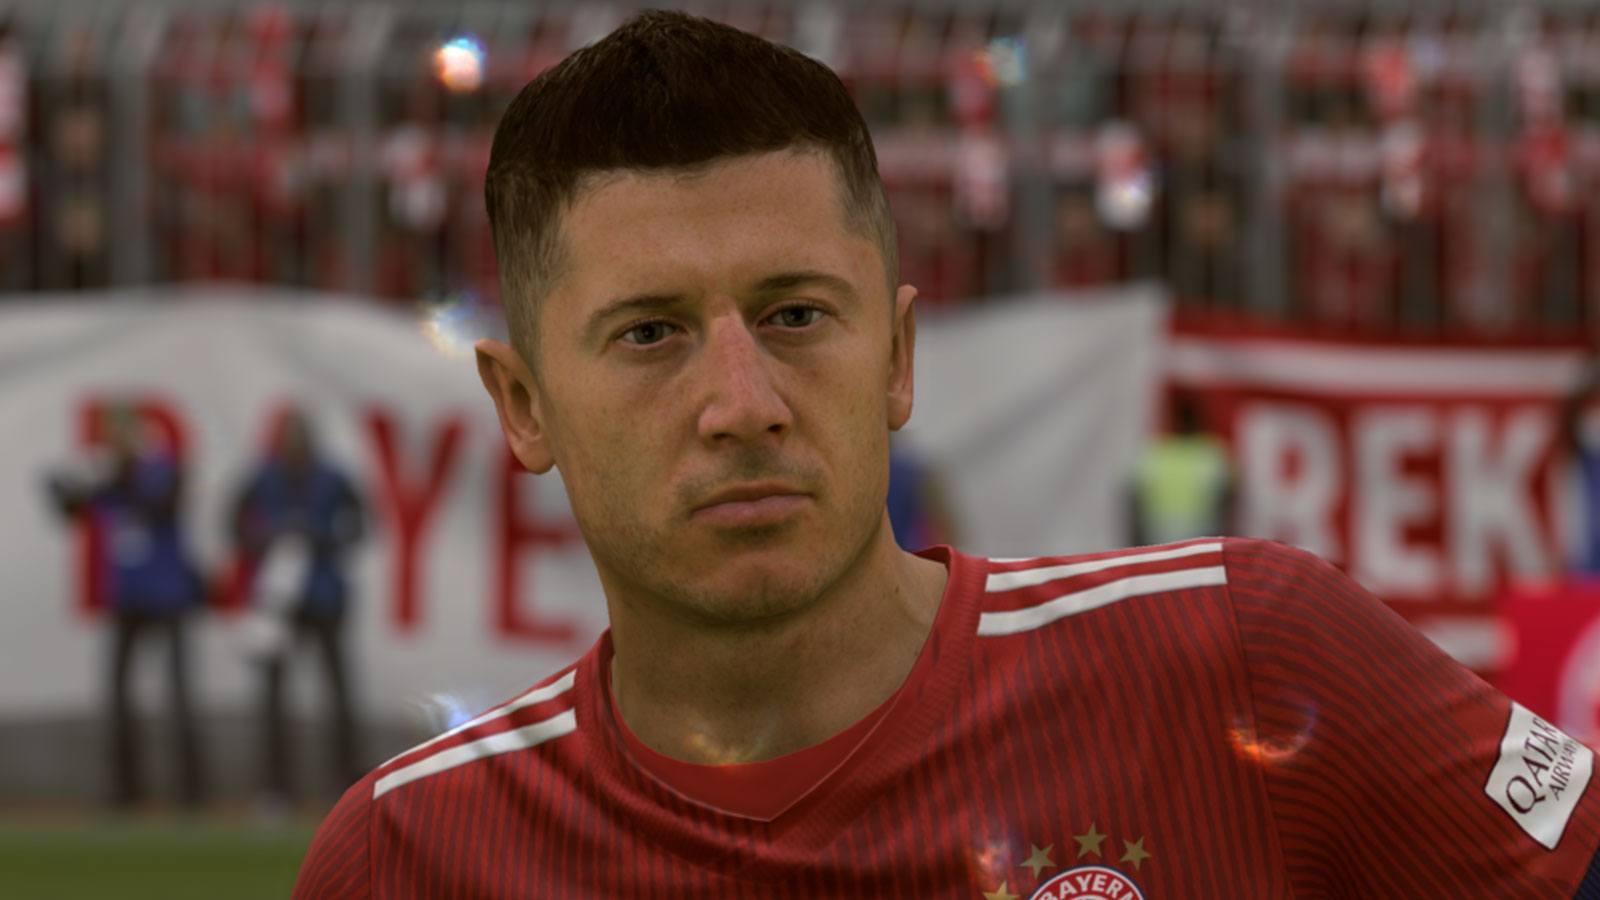 FIFA 21 TOTW 5 prédictions Lewandowski